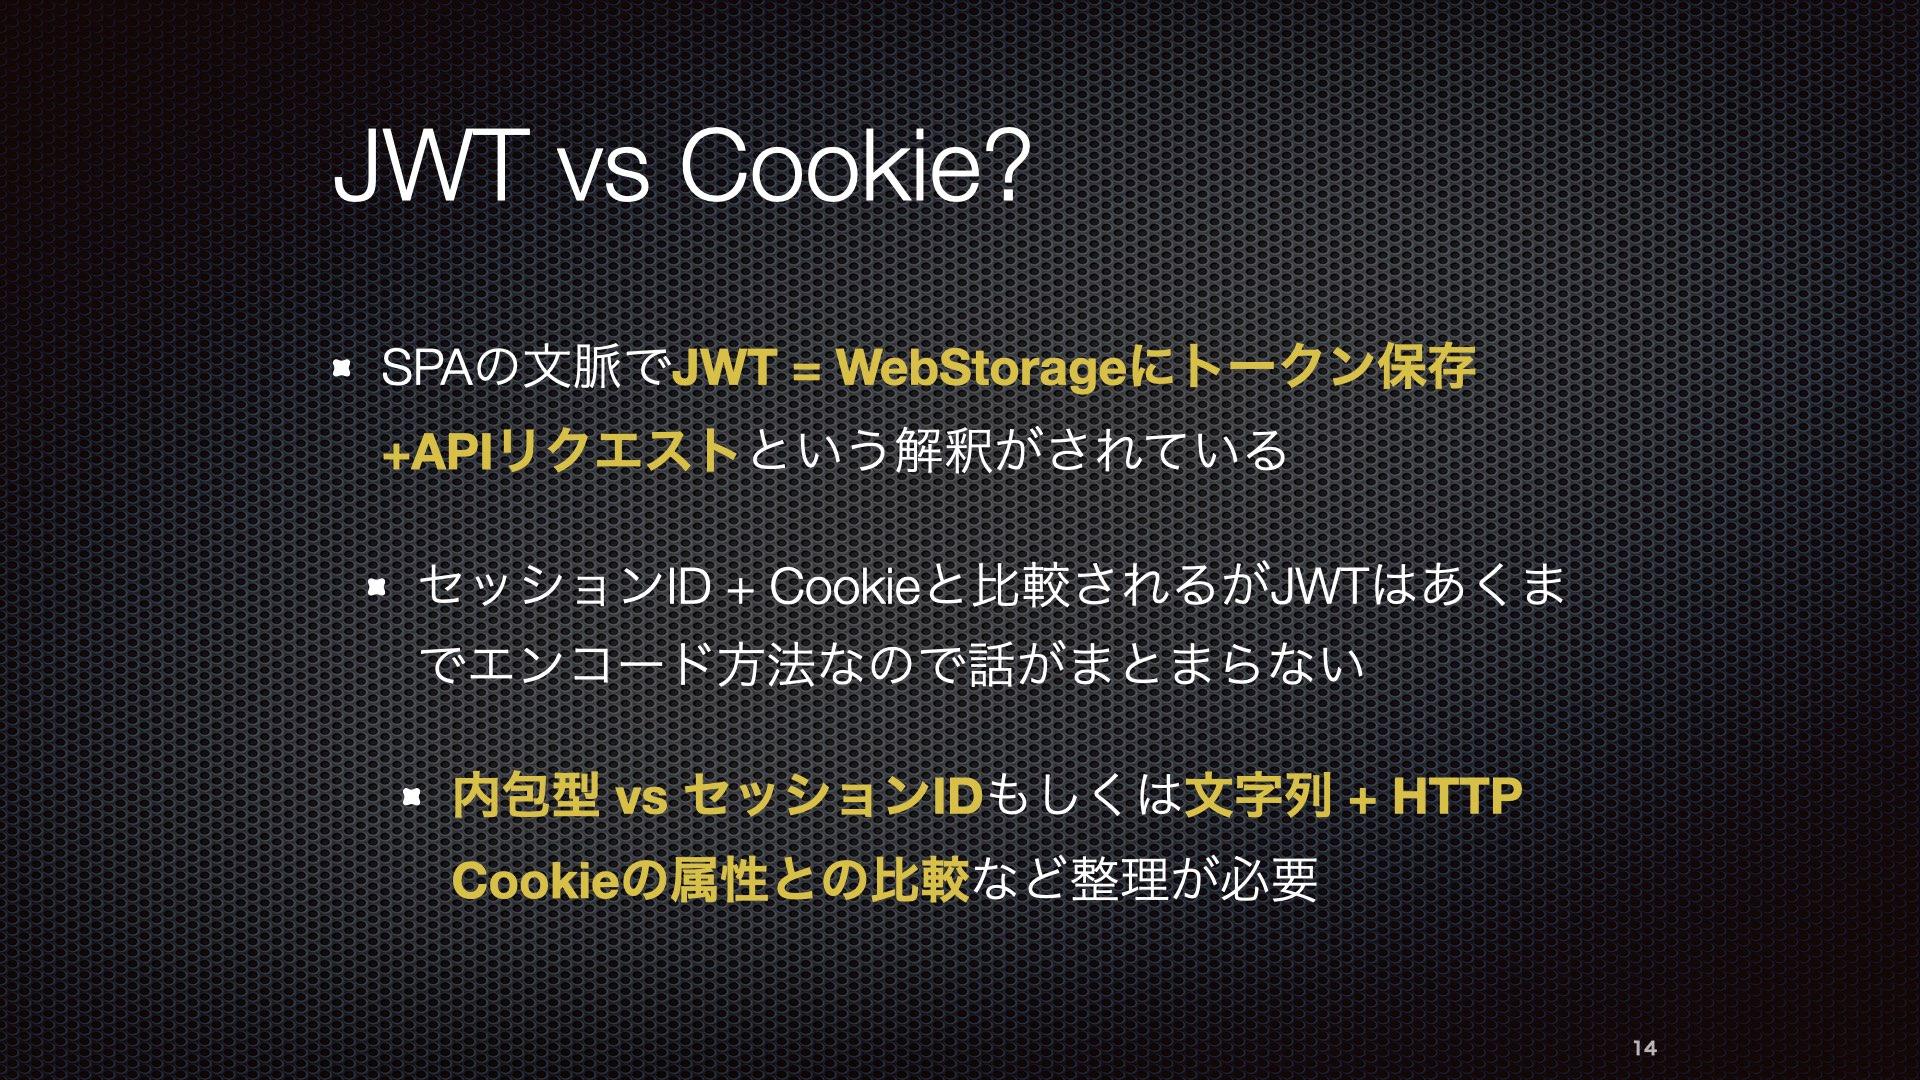 JWTBootCamp2020 014